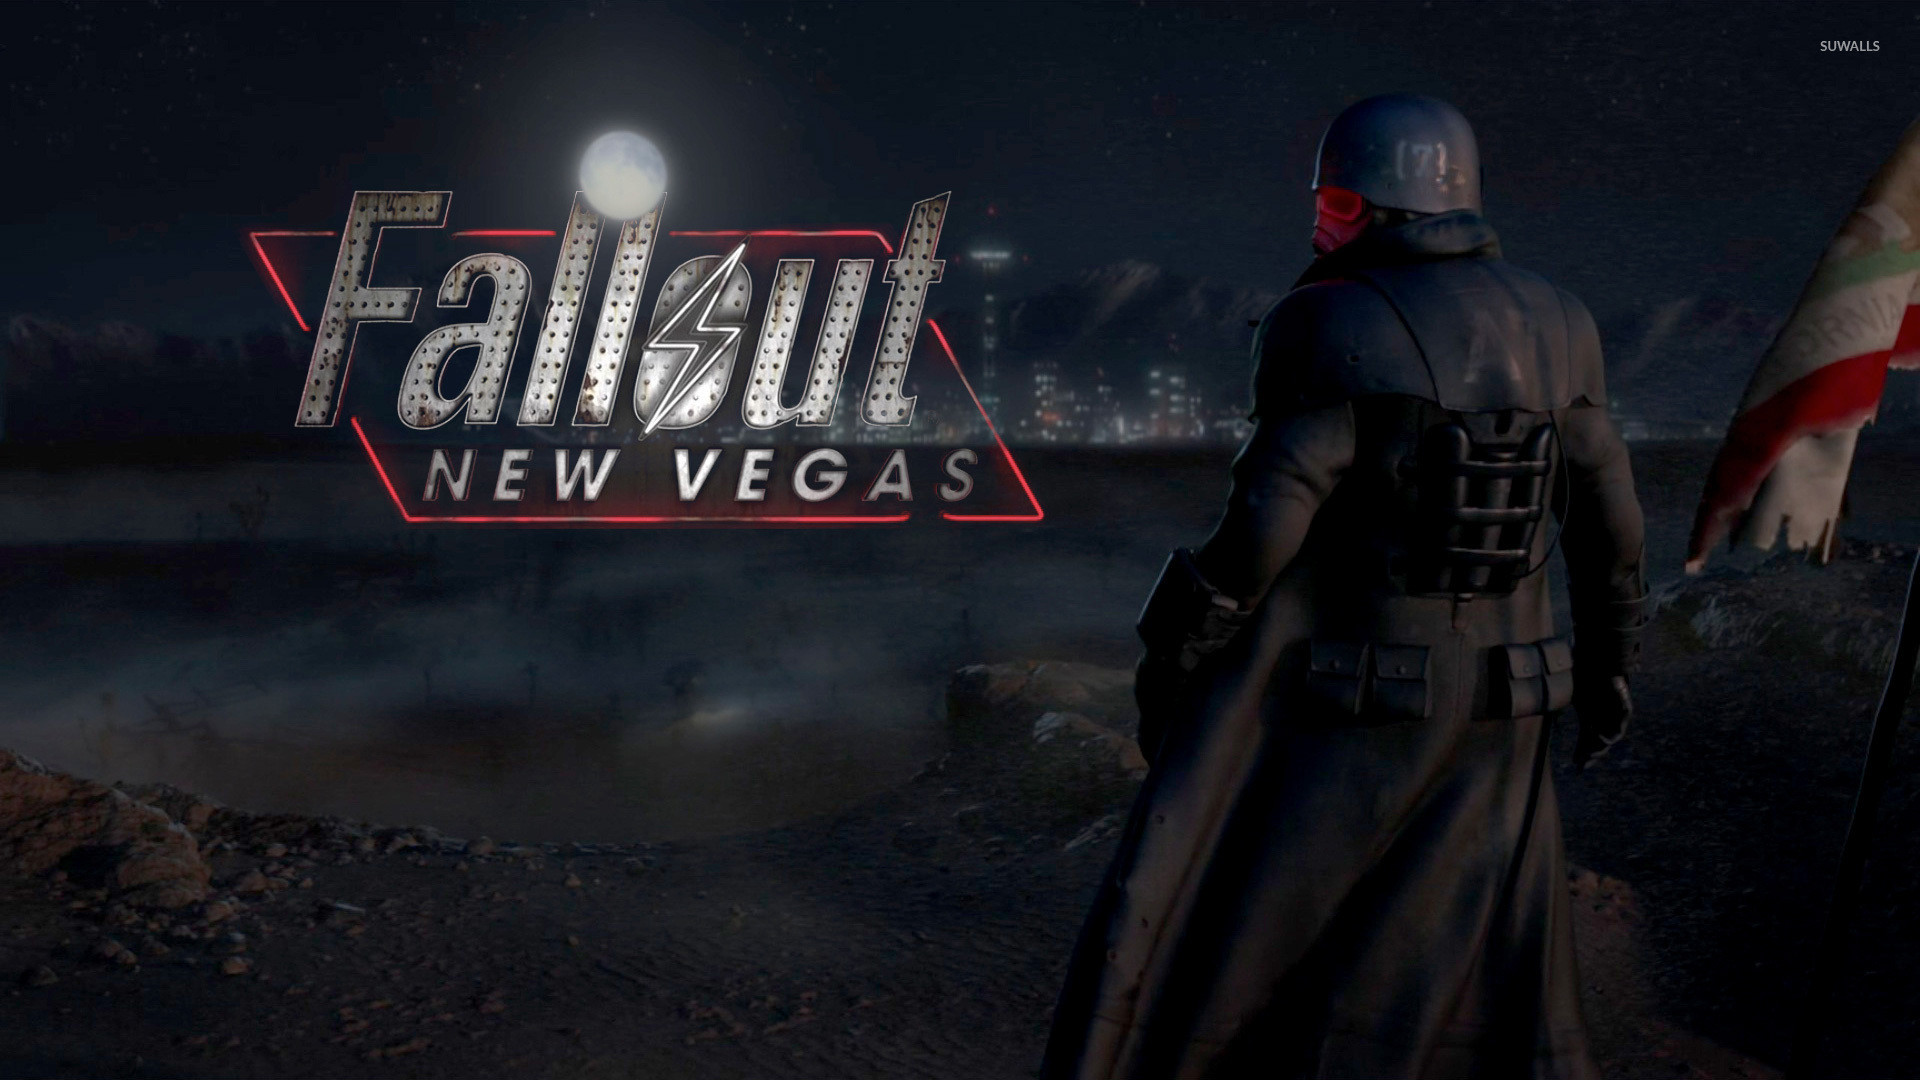 … fallout new vegas 3 wallpaper game wallpapers 8166 …